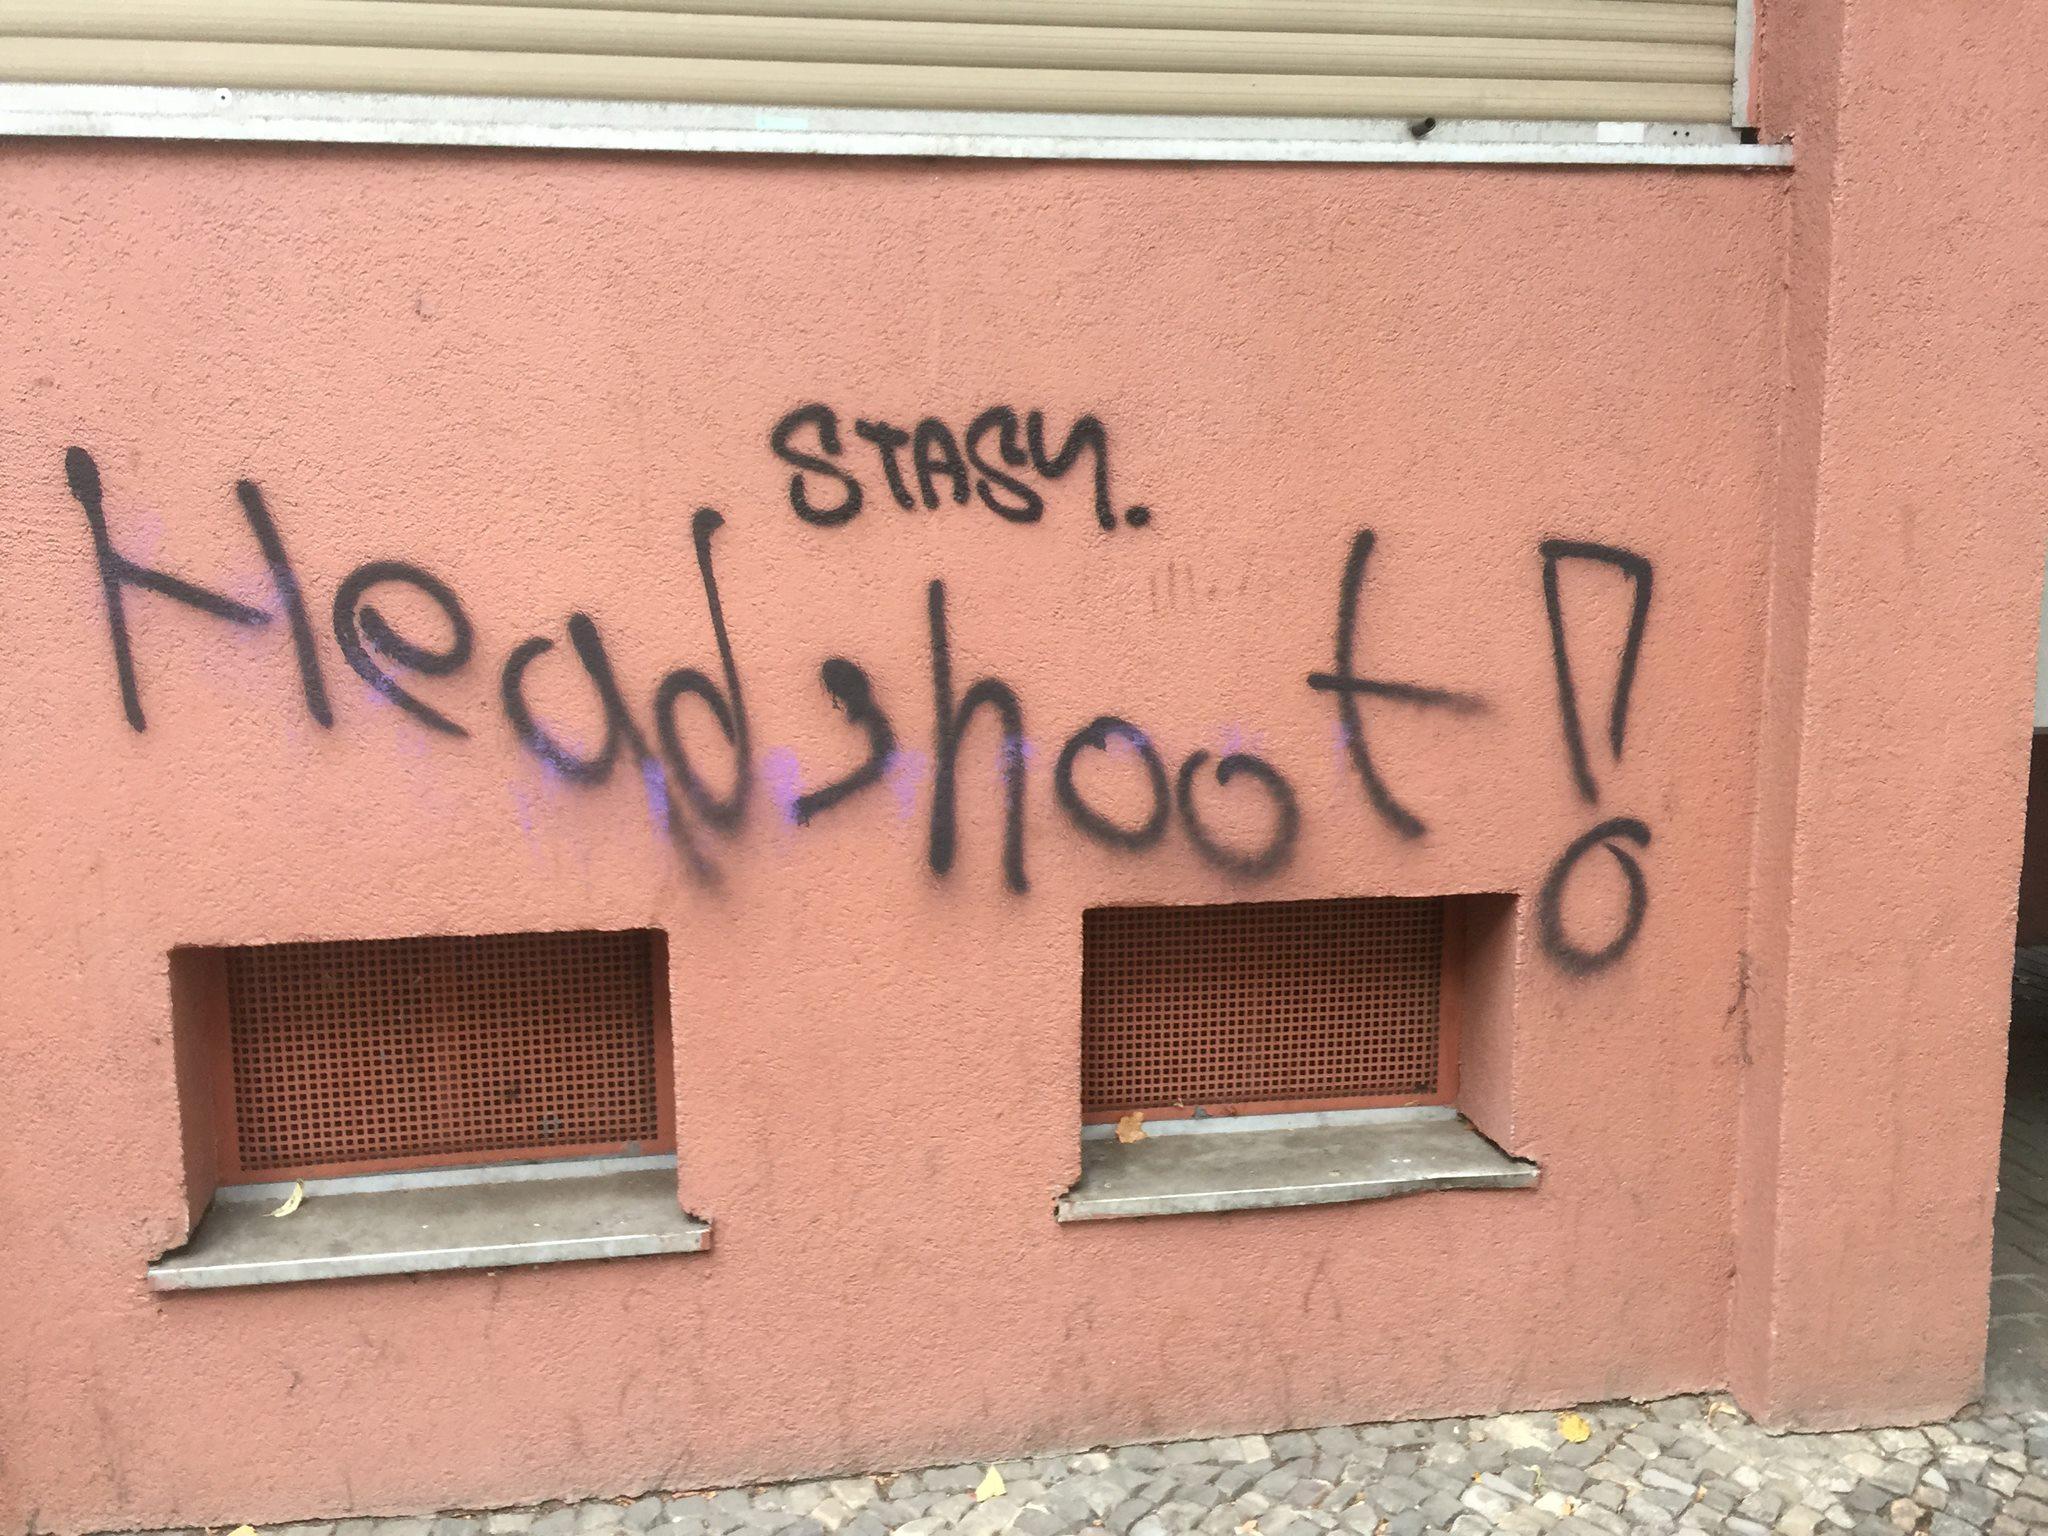 Stasy Headshoot.jpg